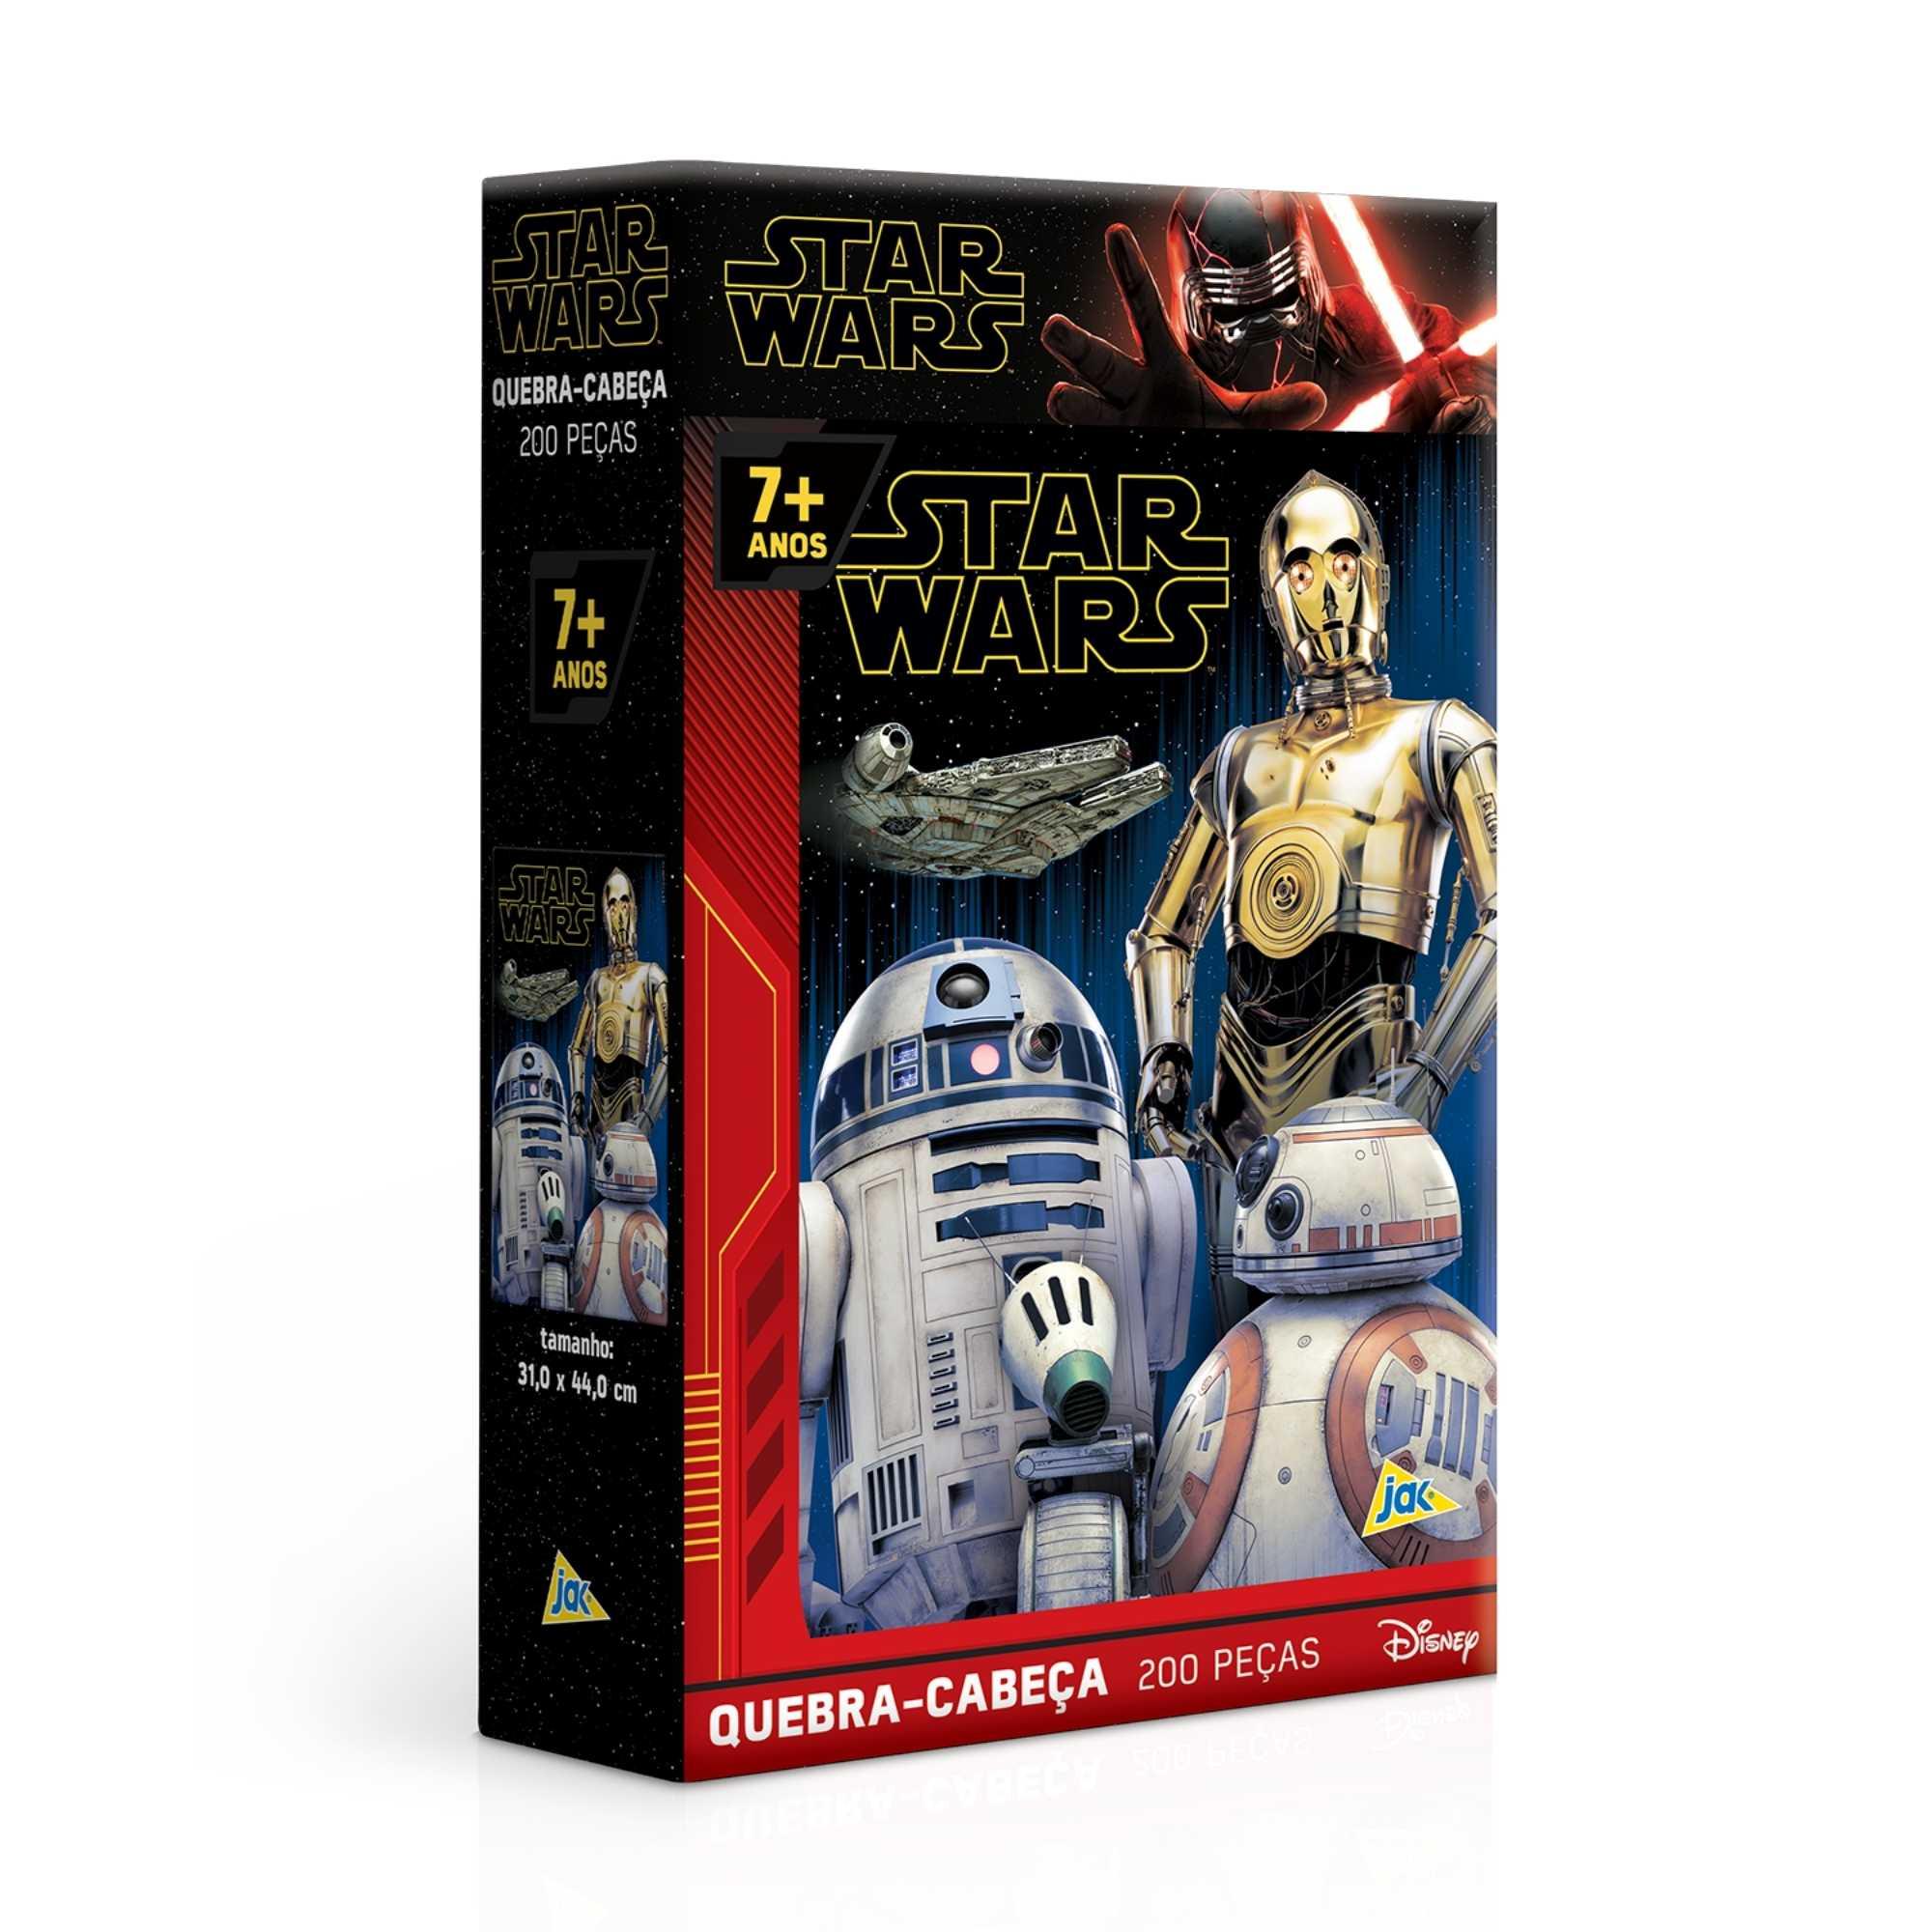 Quebra-cabeça Star Wars Ascensão Skywalker Droides 200 peças - Game Office